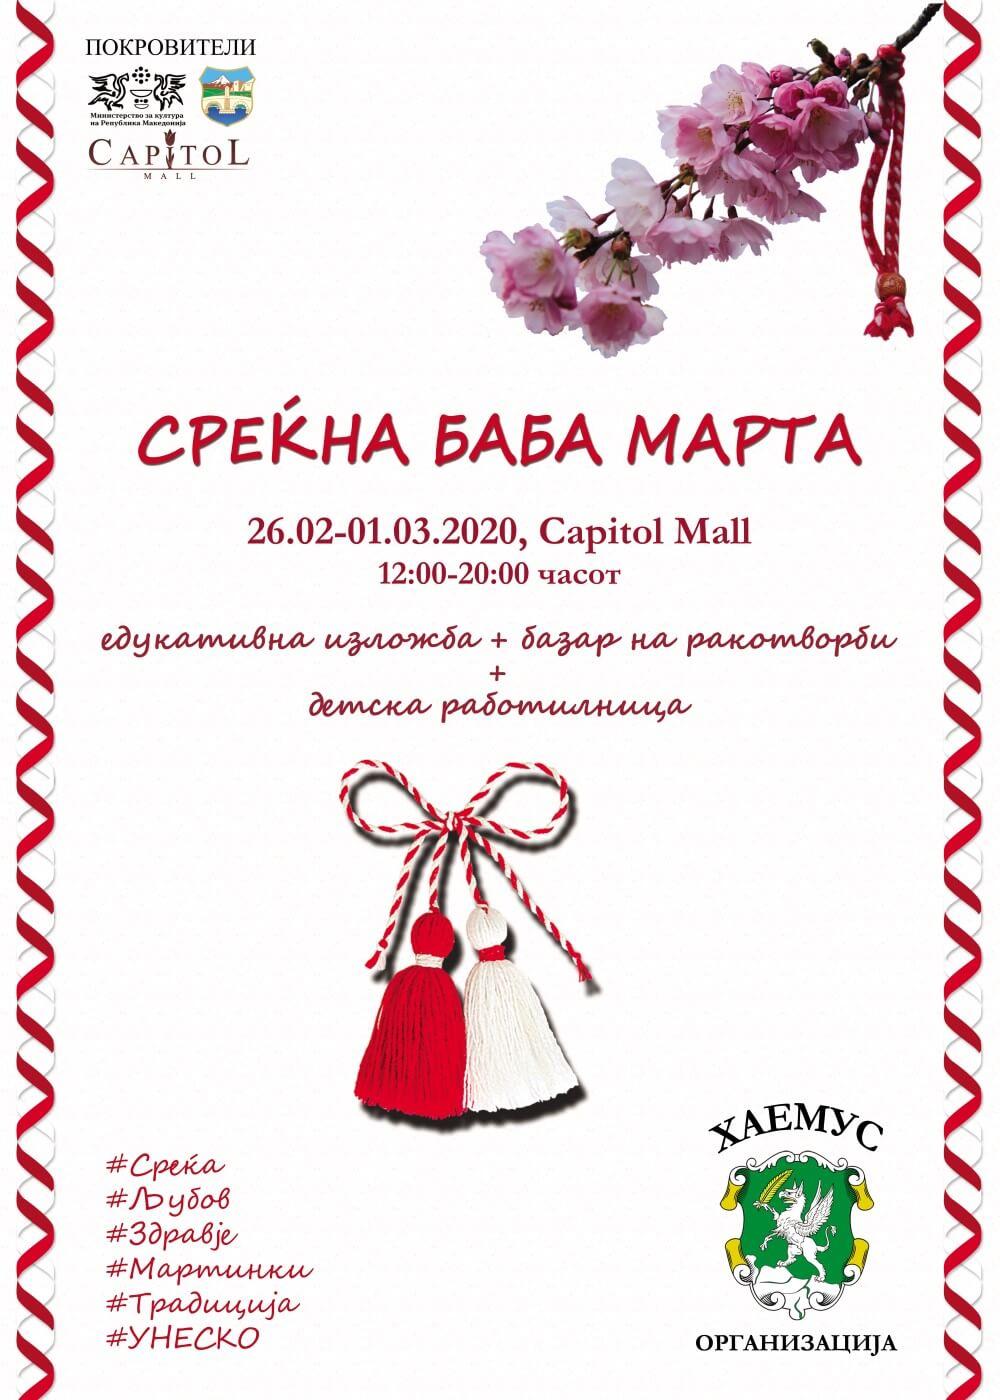 HAEMUS_GRandma_March_Day_Poster_exhibition_martinki_2020